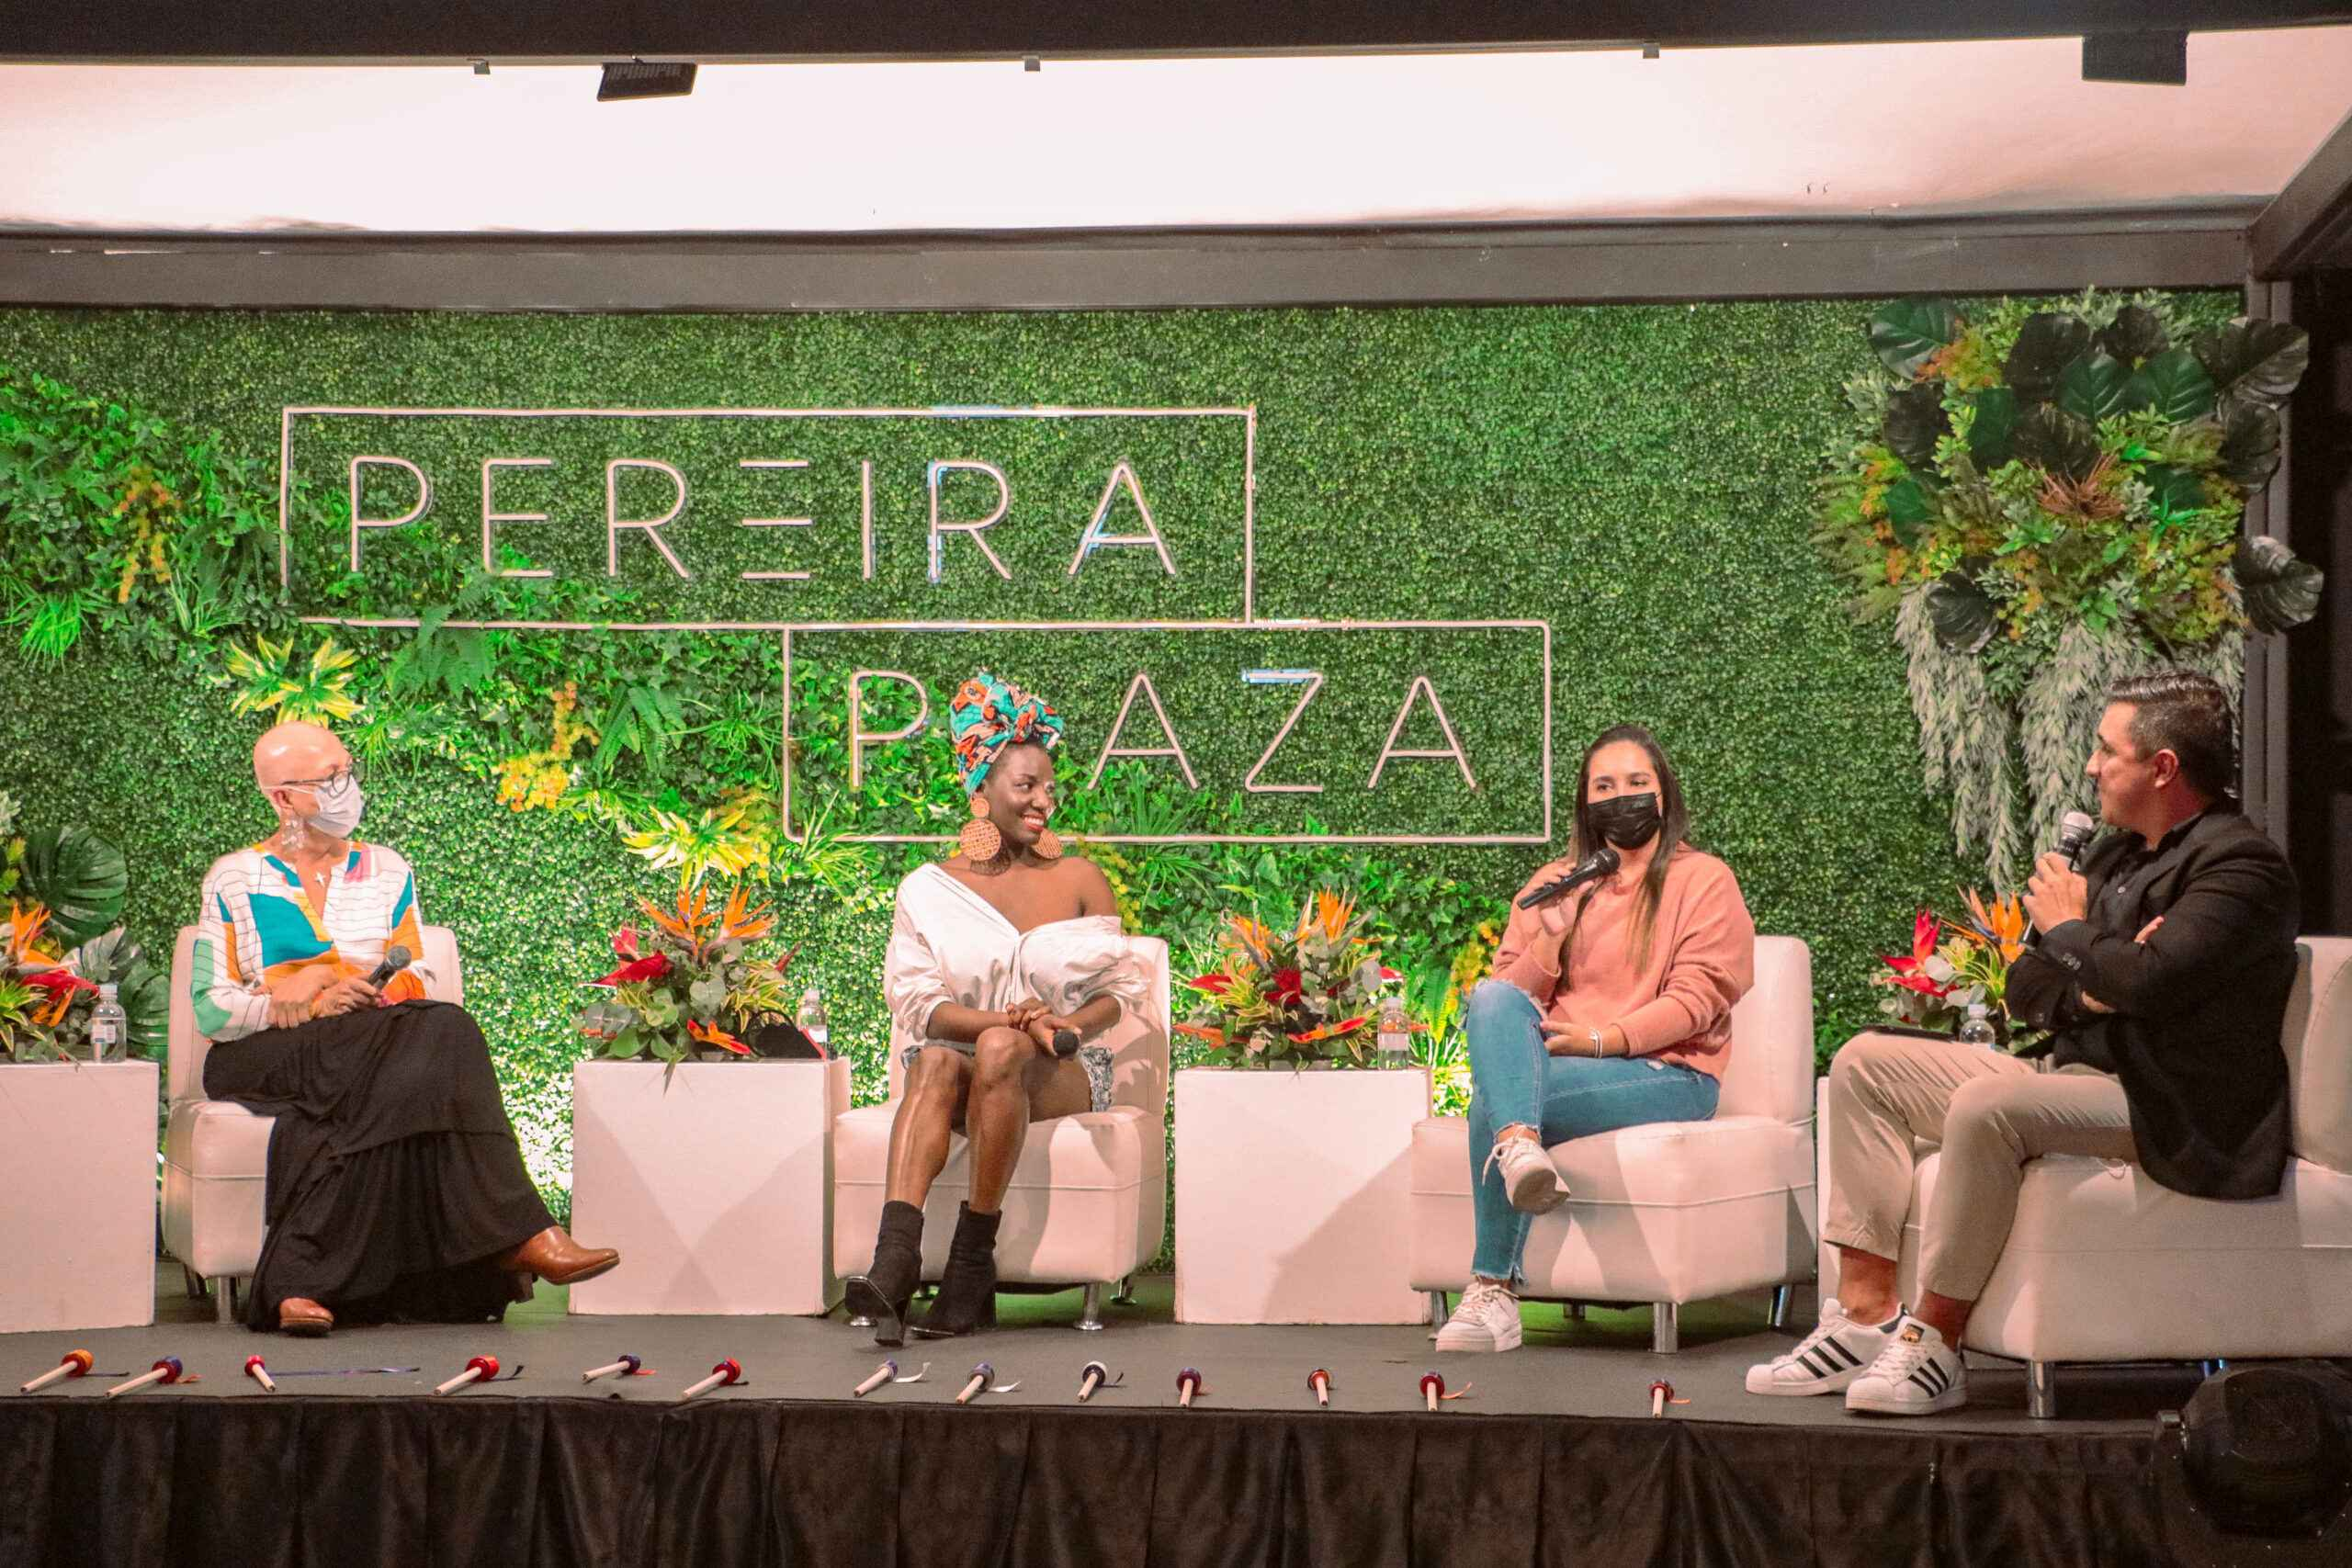 Pereira Plaza renueva su imagen